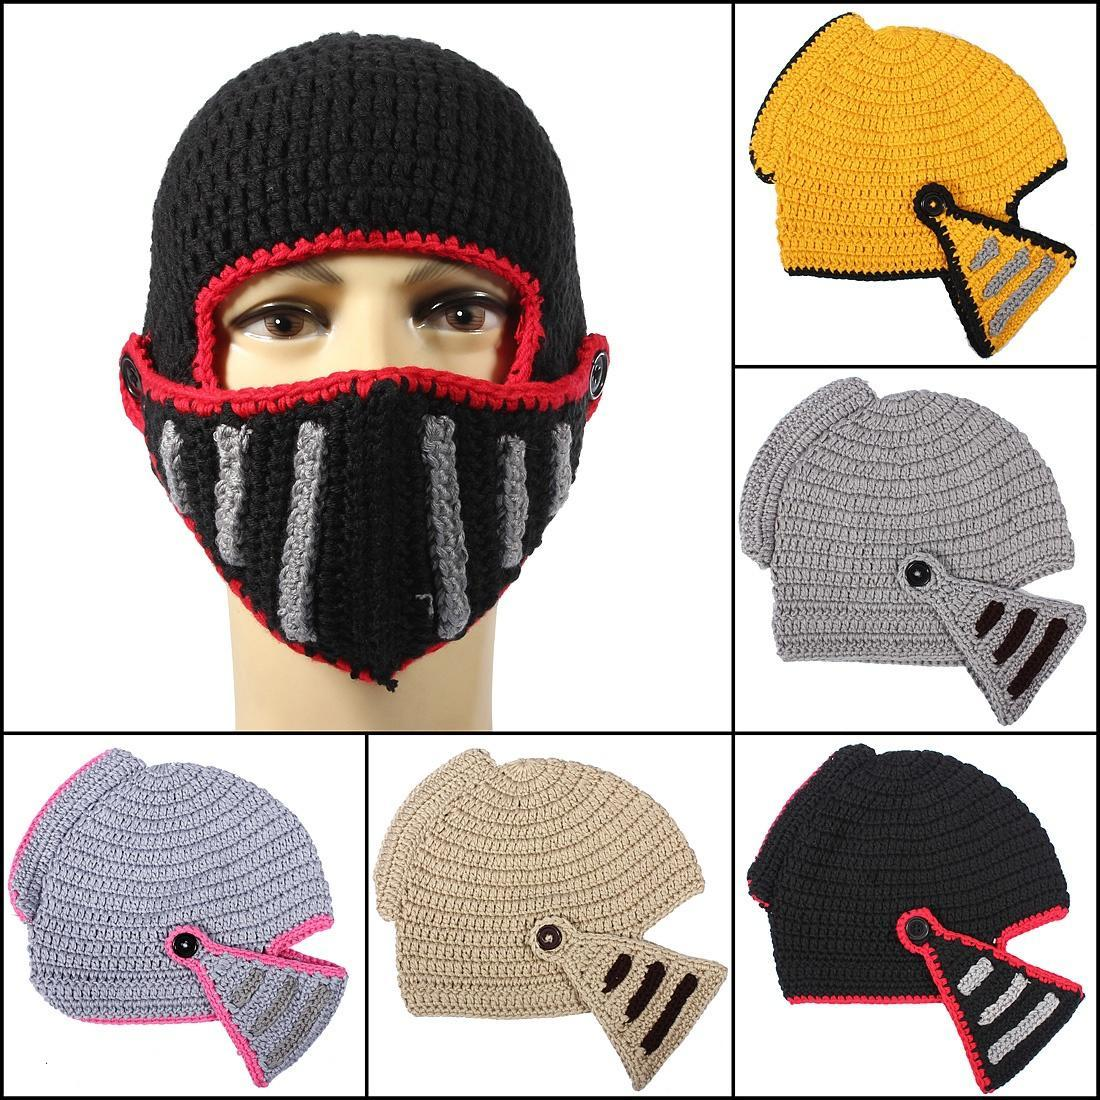 Мужчины зима теплая шапочка Римской мягкая шапочка шапочка шлем лицо маска вязание рыцарь шапочка маска ферби черная uni